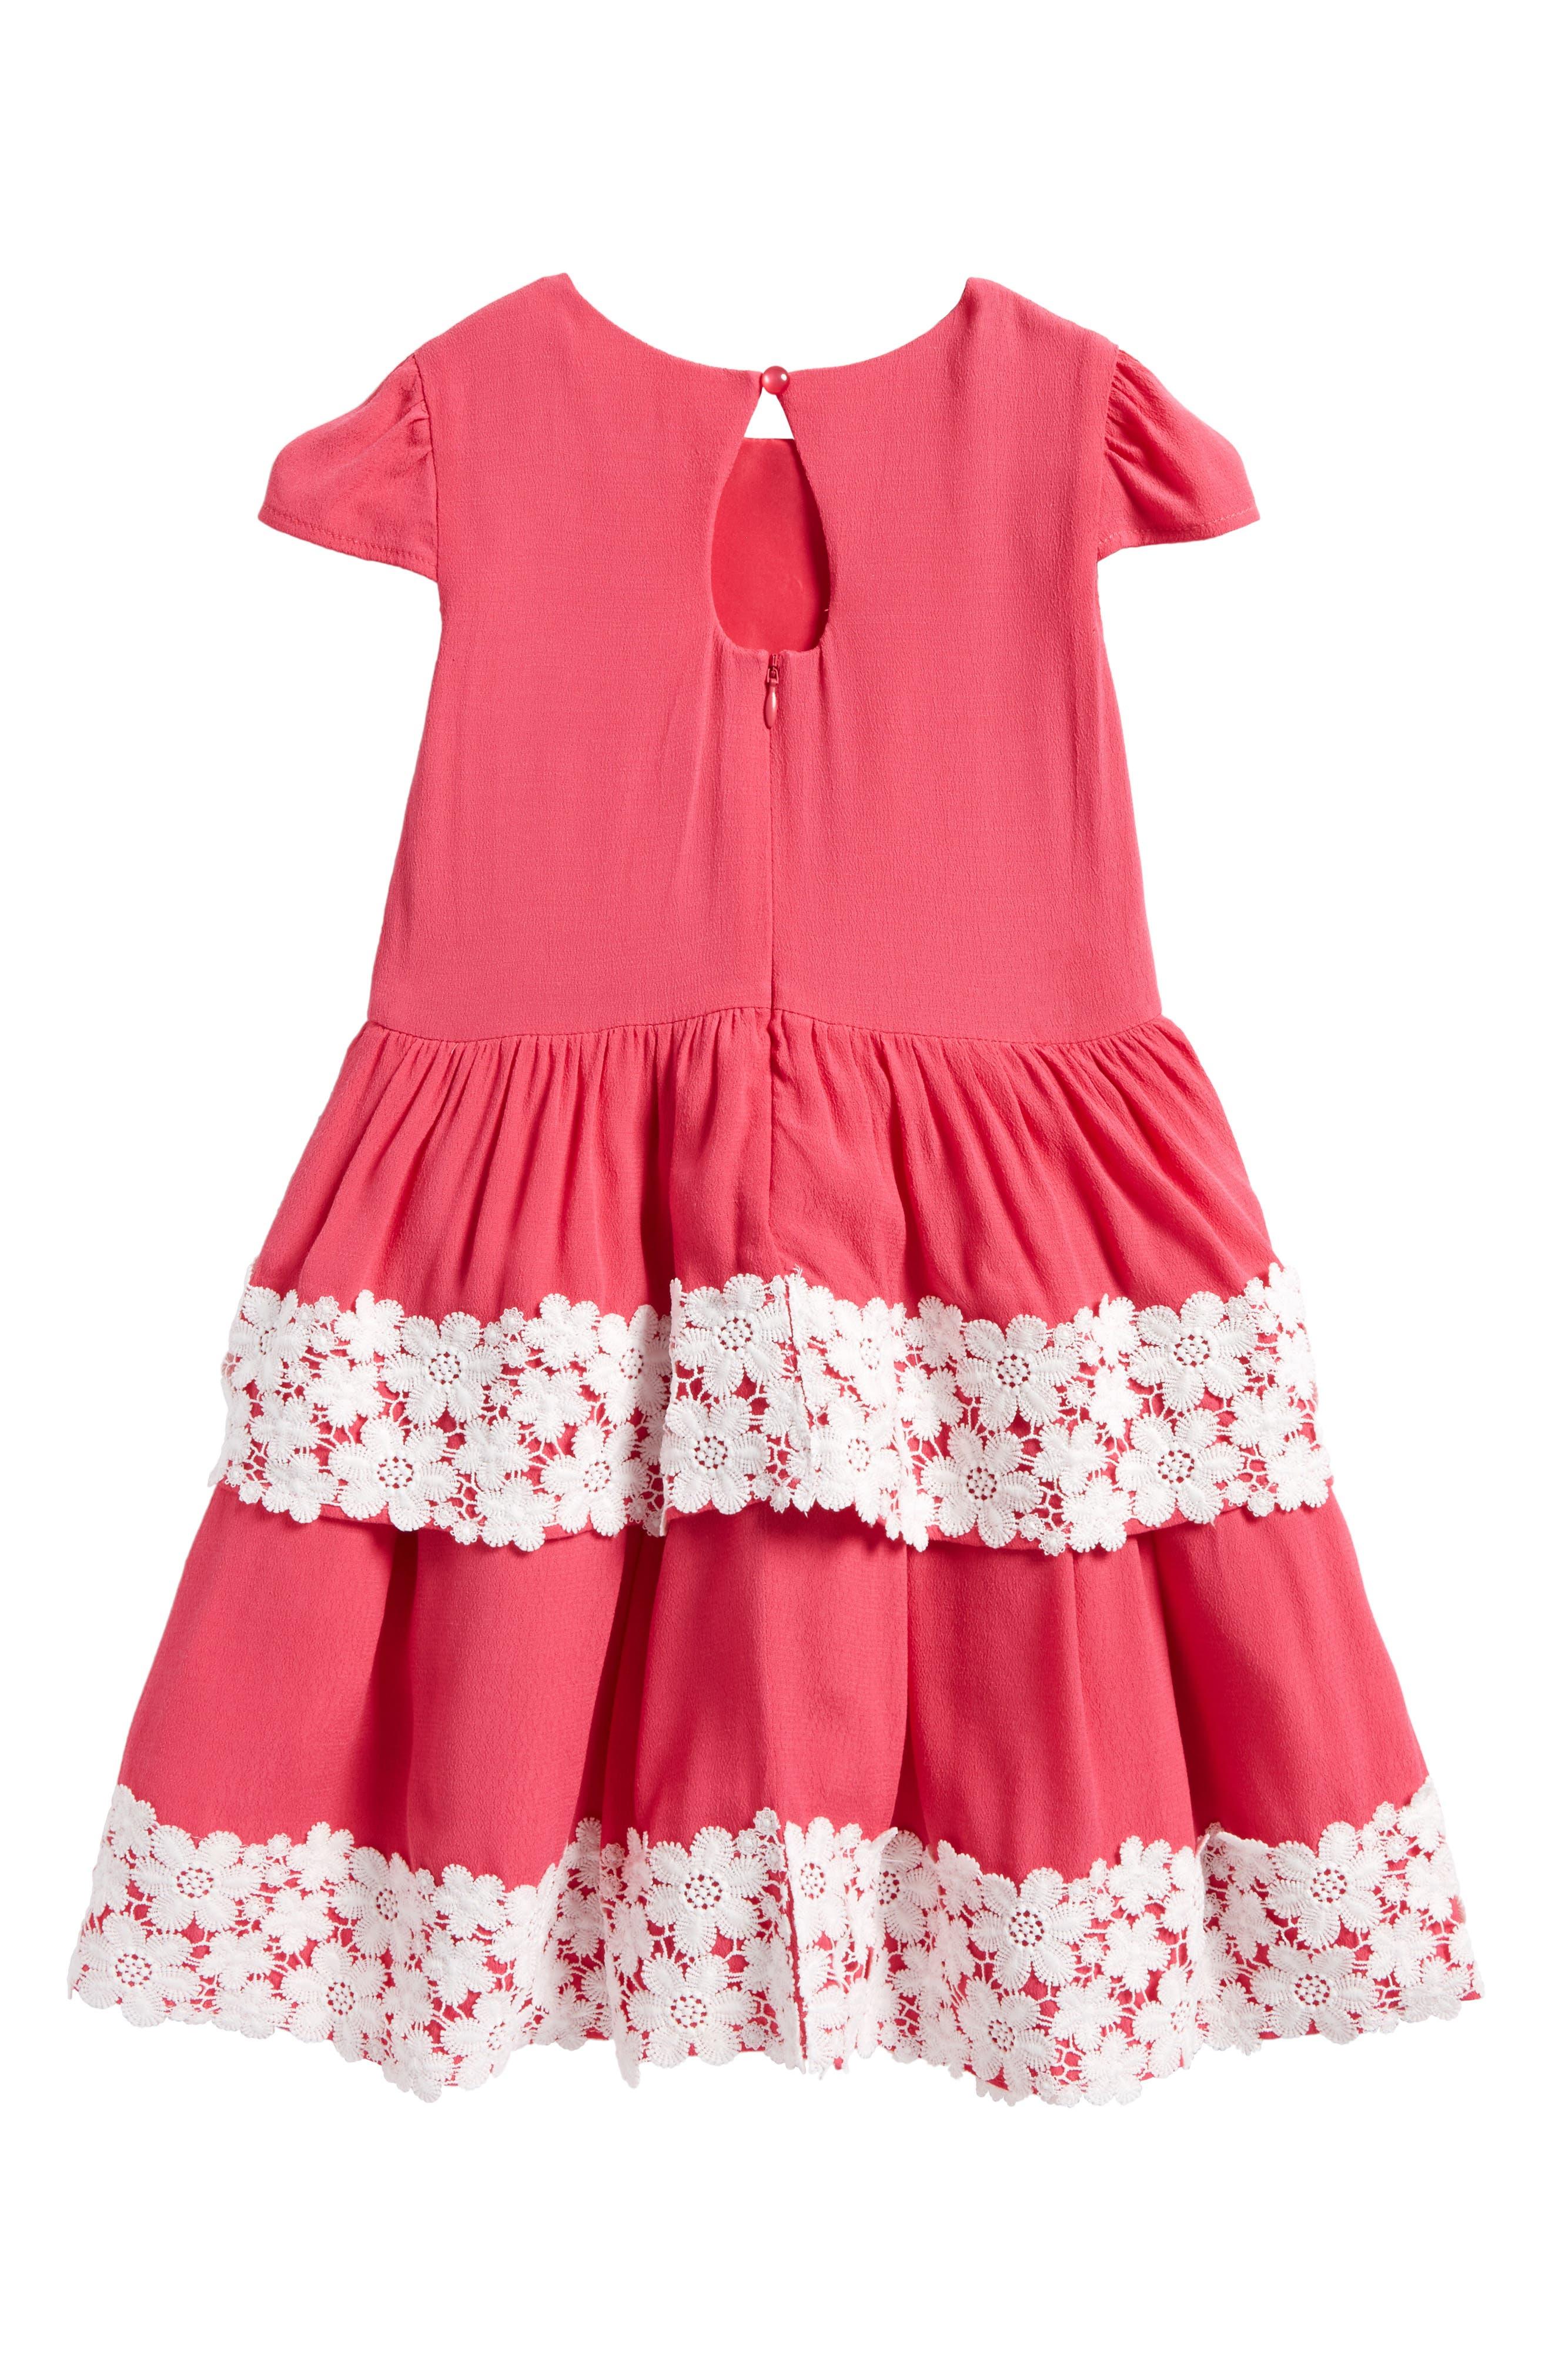 Tiered Skirt Dress,                             Alternate thumbnail 2, color,                             953